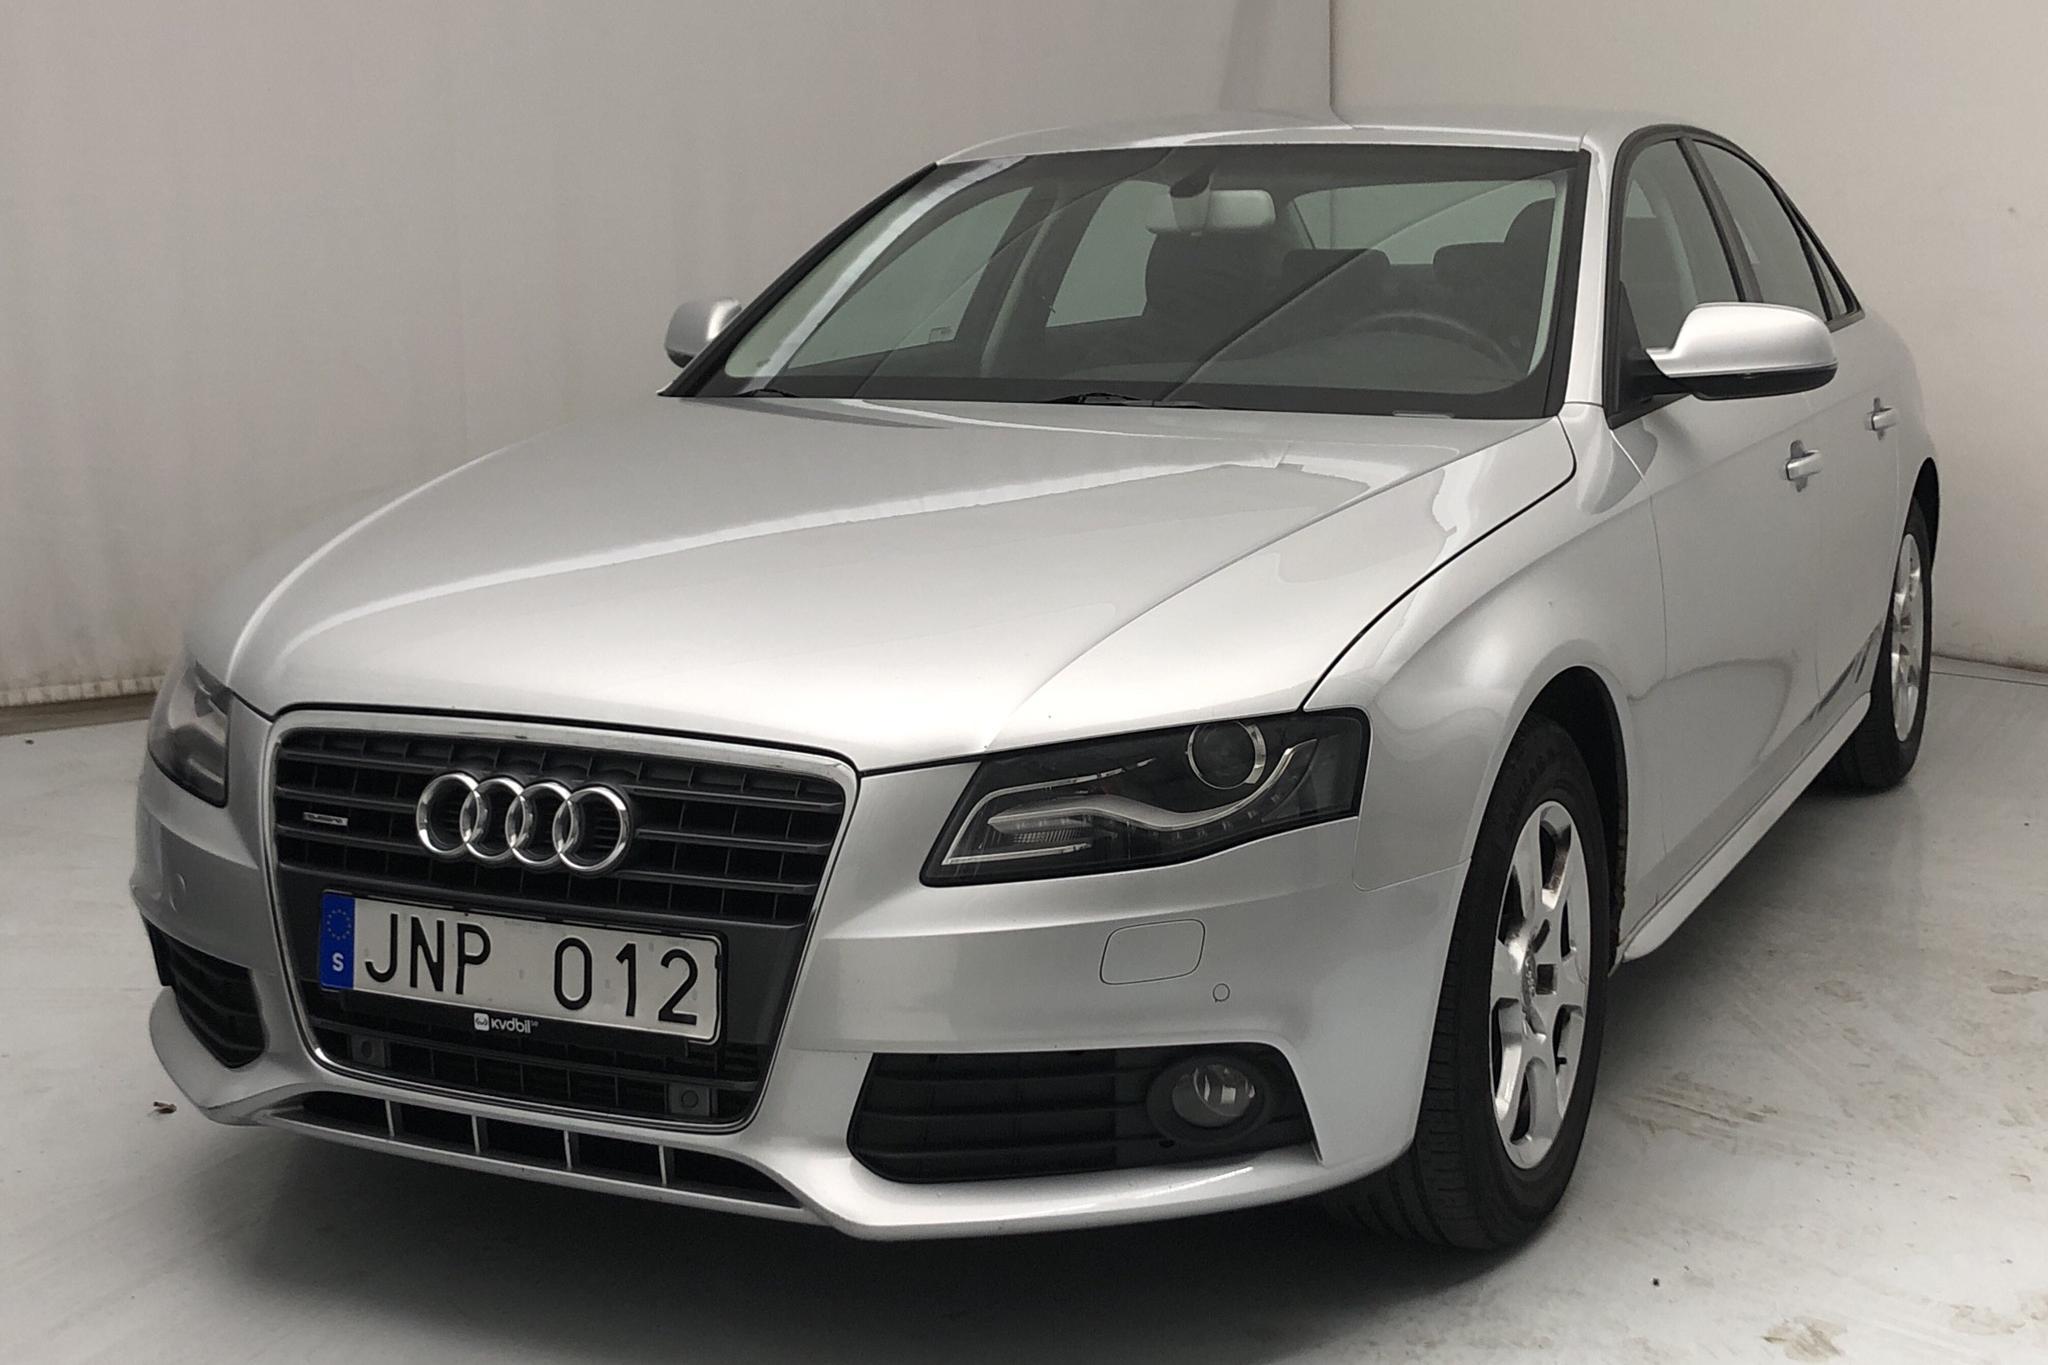 Audi A4 2.0 TFSI quattro (211hk)